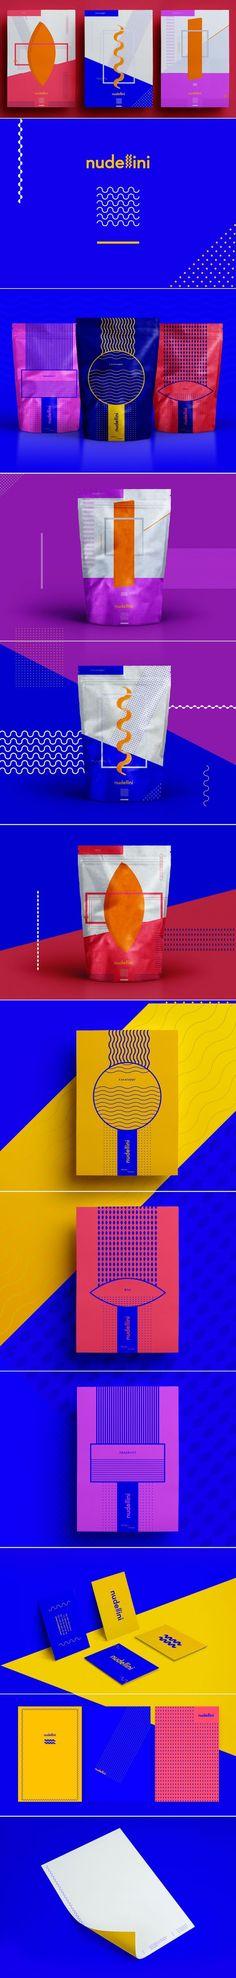 Nudellini Food Branding and Packaging by Ewelina Gąska | Fivestar Branding Agency – Design and Branding Agency & Curated Inspiration Gallery